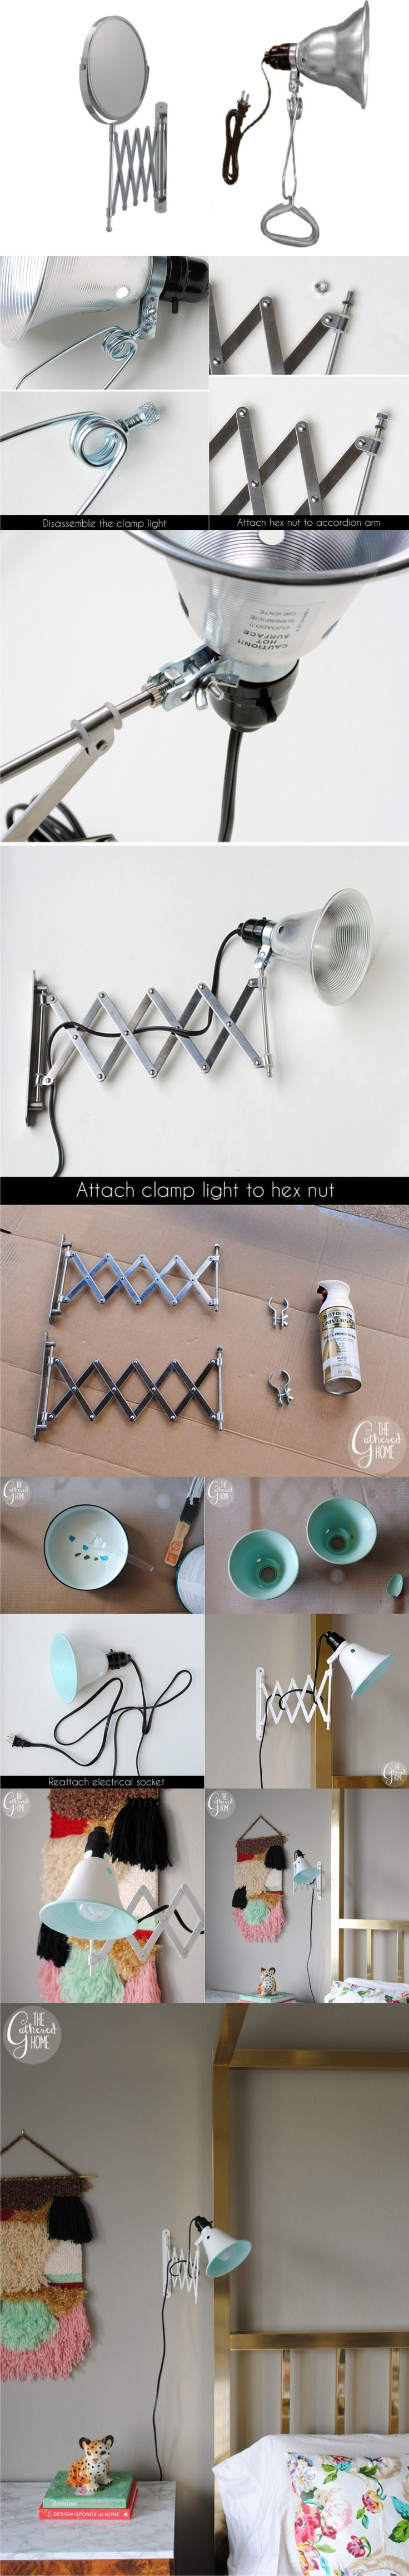 Ingenioso hack de ikea para crear una lámpara / Via http://www.thegatheredhome.com/